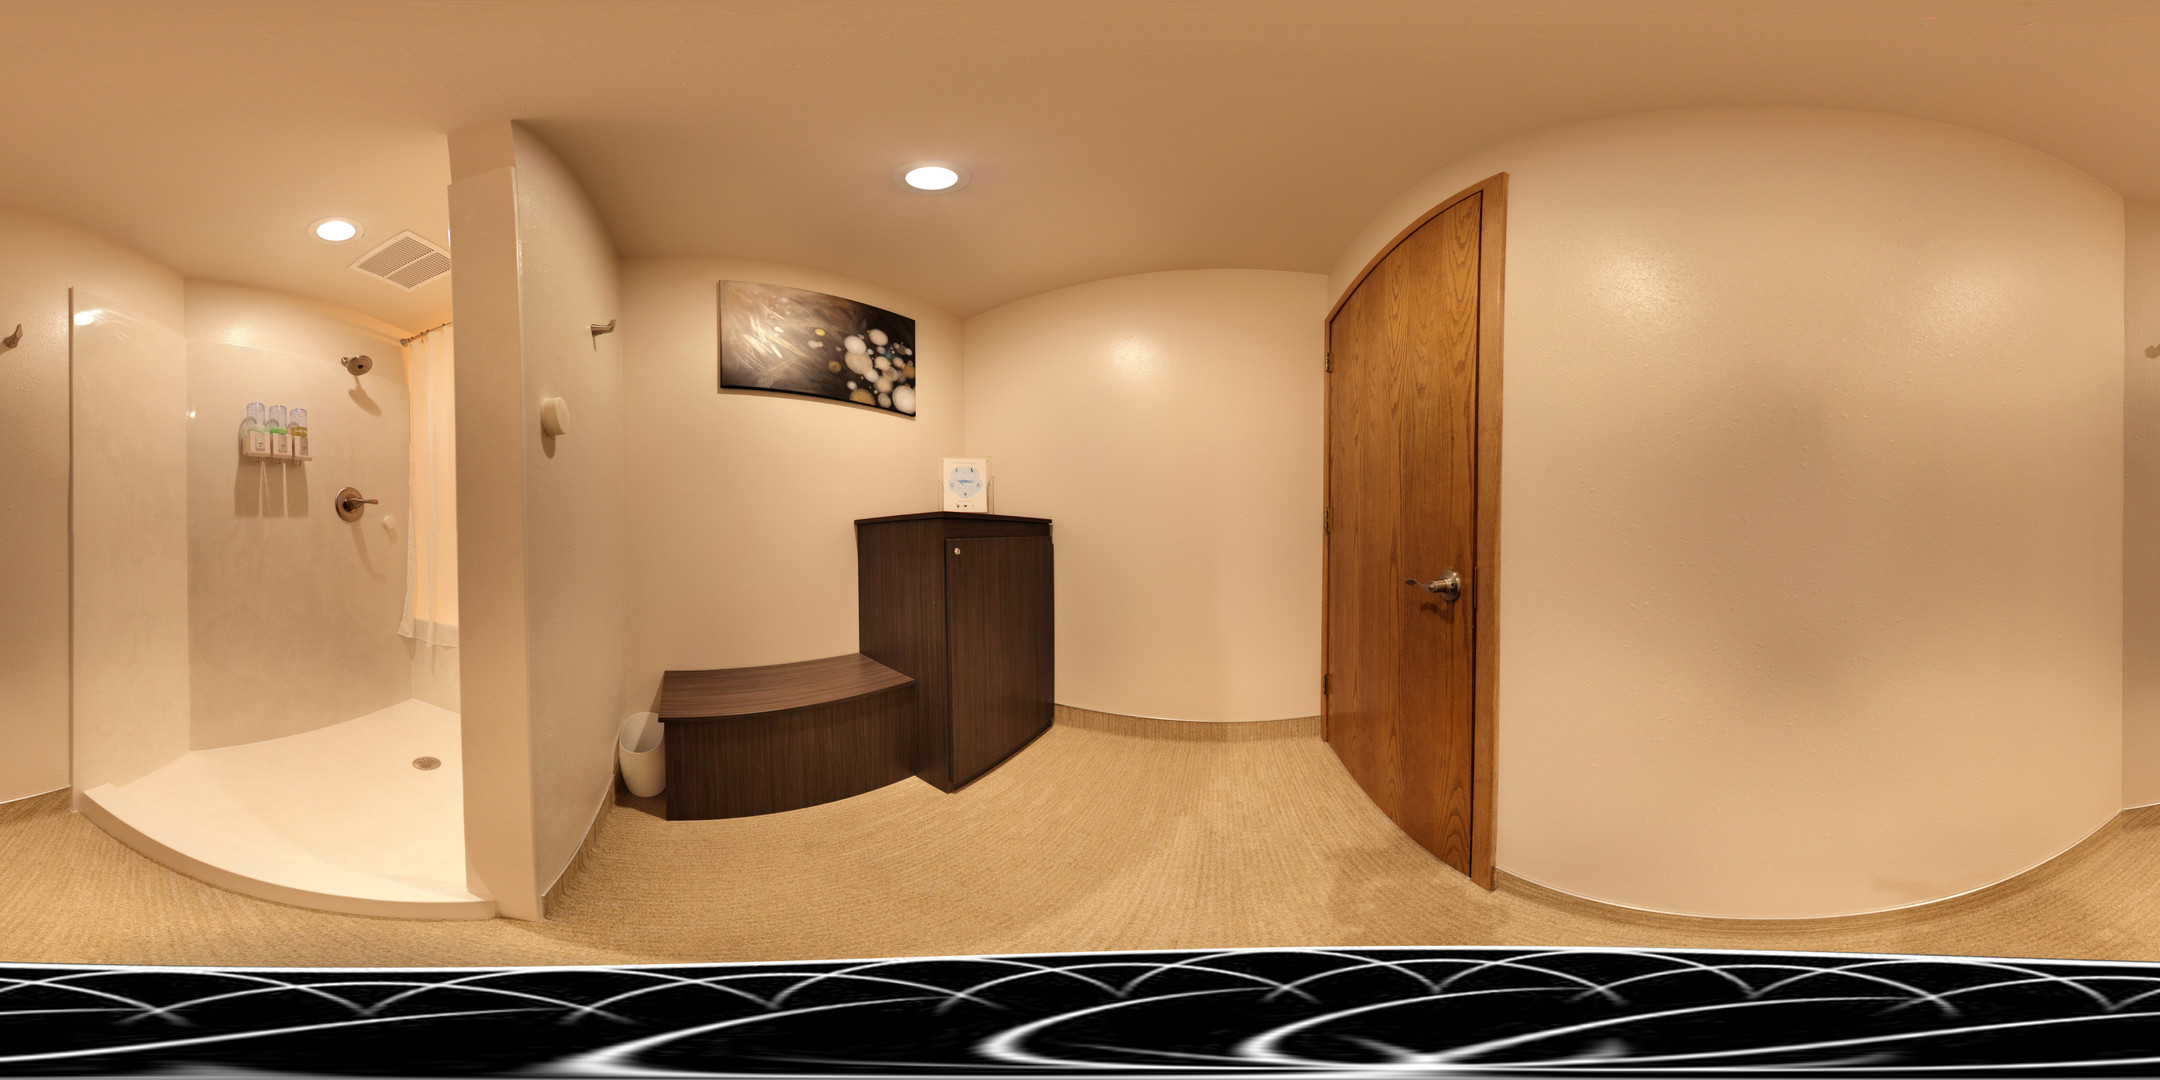 Cabin Float Room Panorama